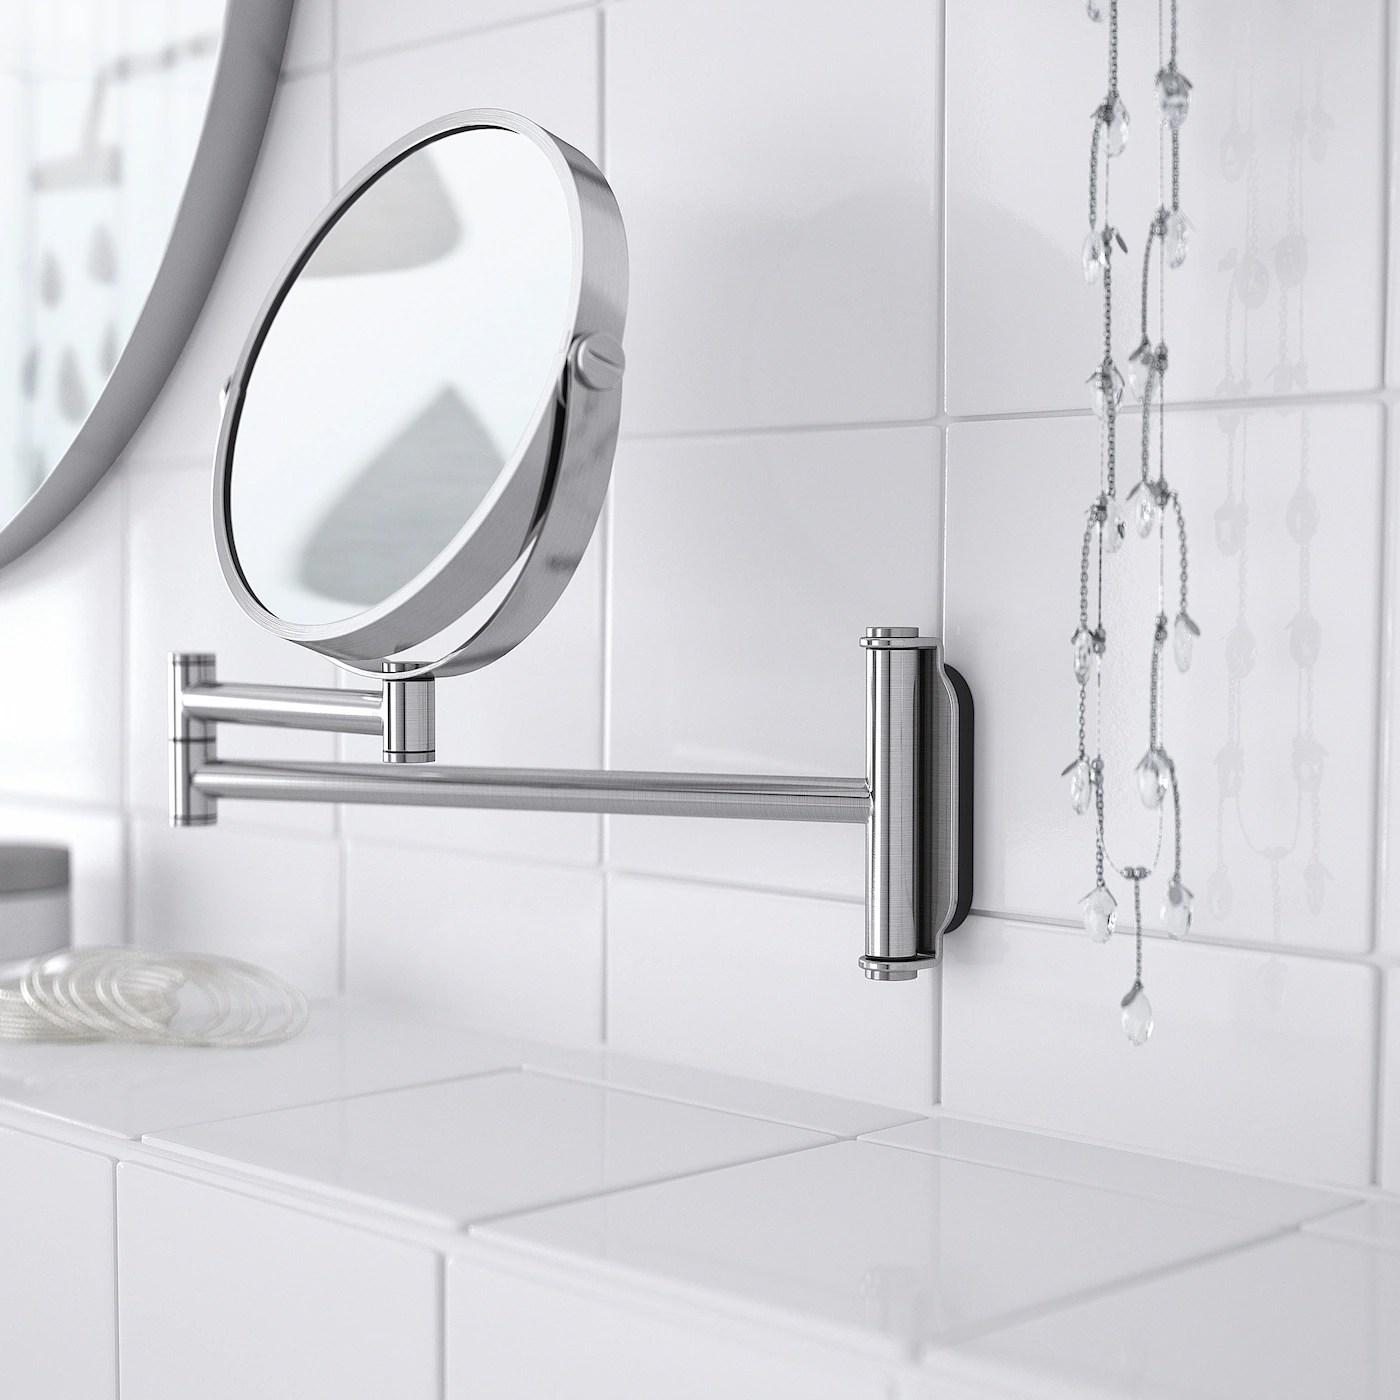 Brogrund Miroir Acier Inoxydable 3x27 Cm Sans Plomb Ikea